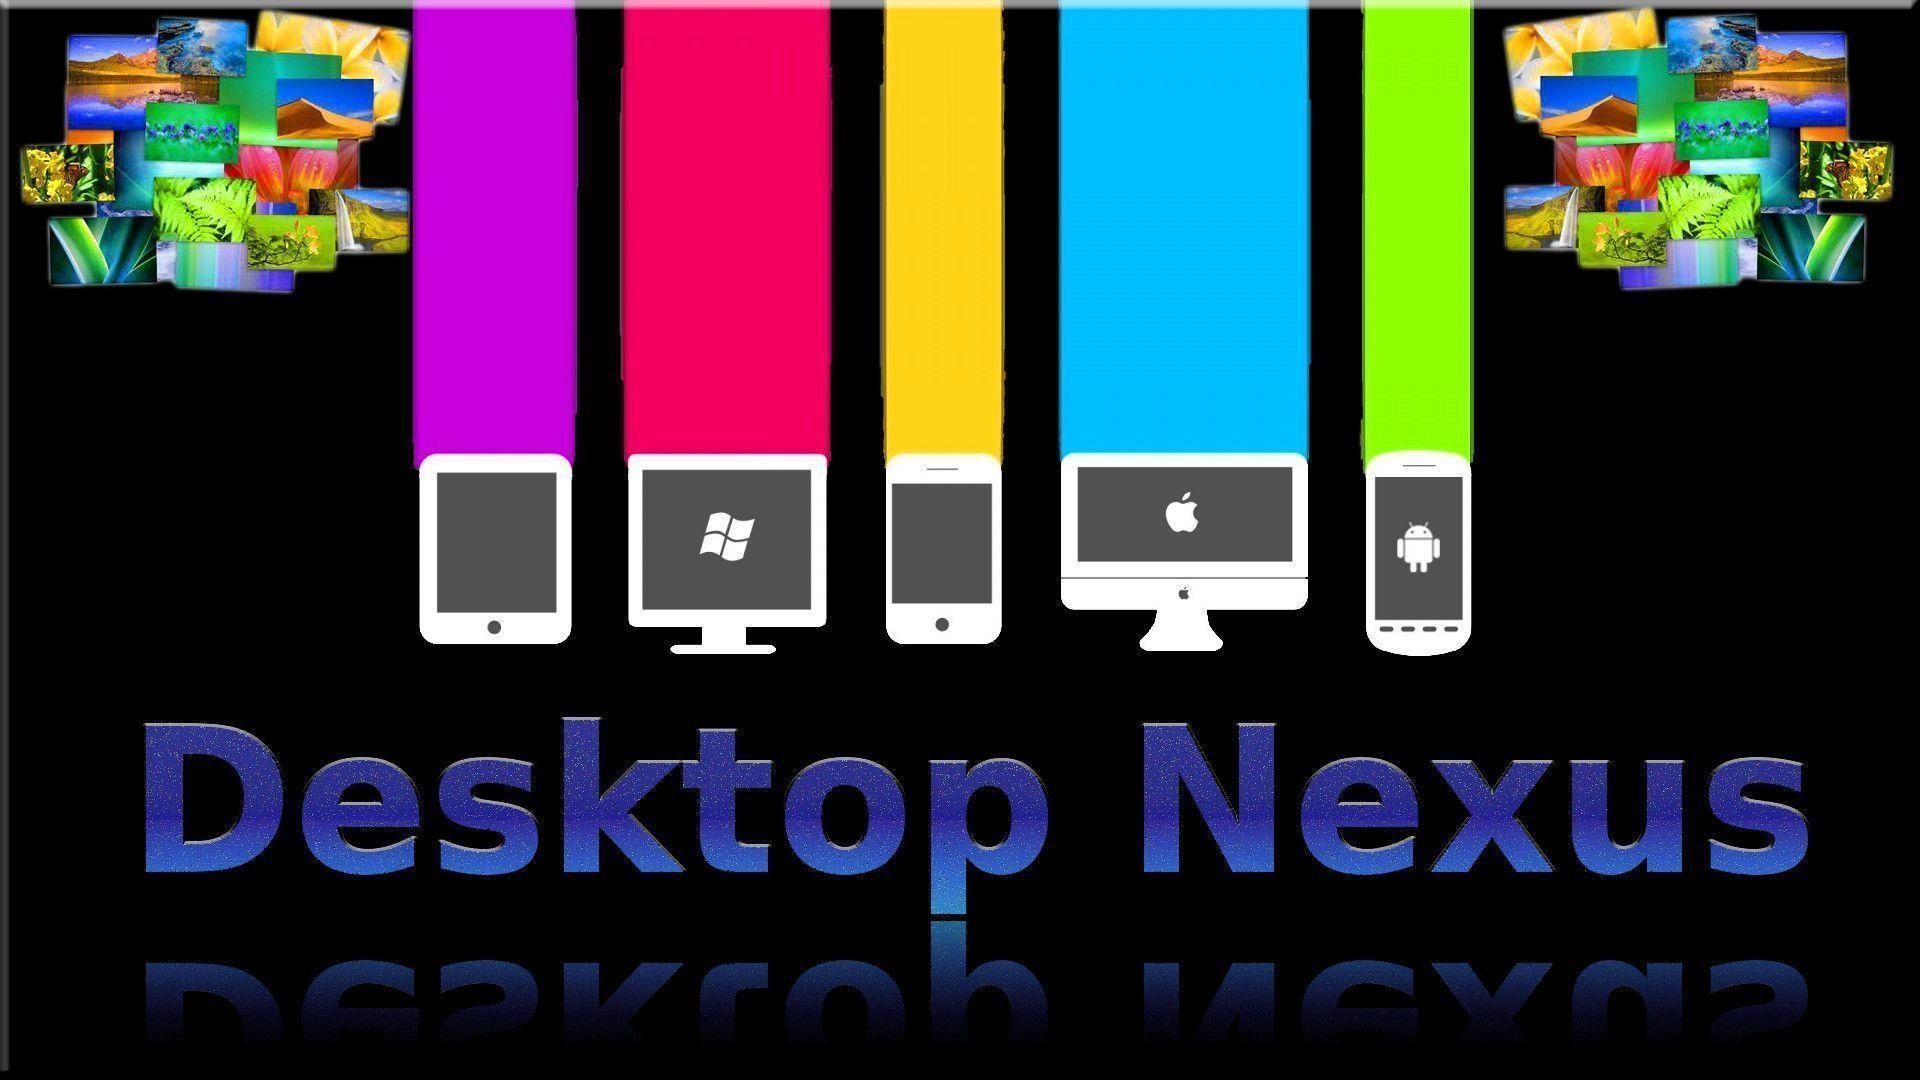 Abstract Free Desktop Wallpaper Nexus Nature #5344 Hd Wallpapers .